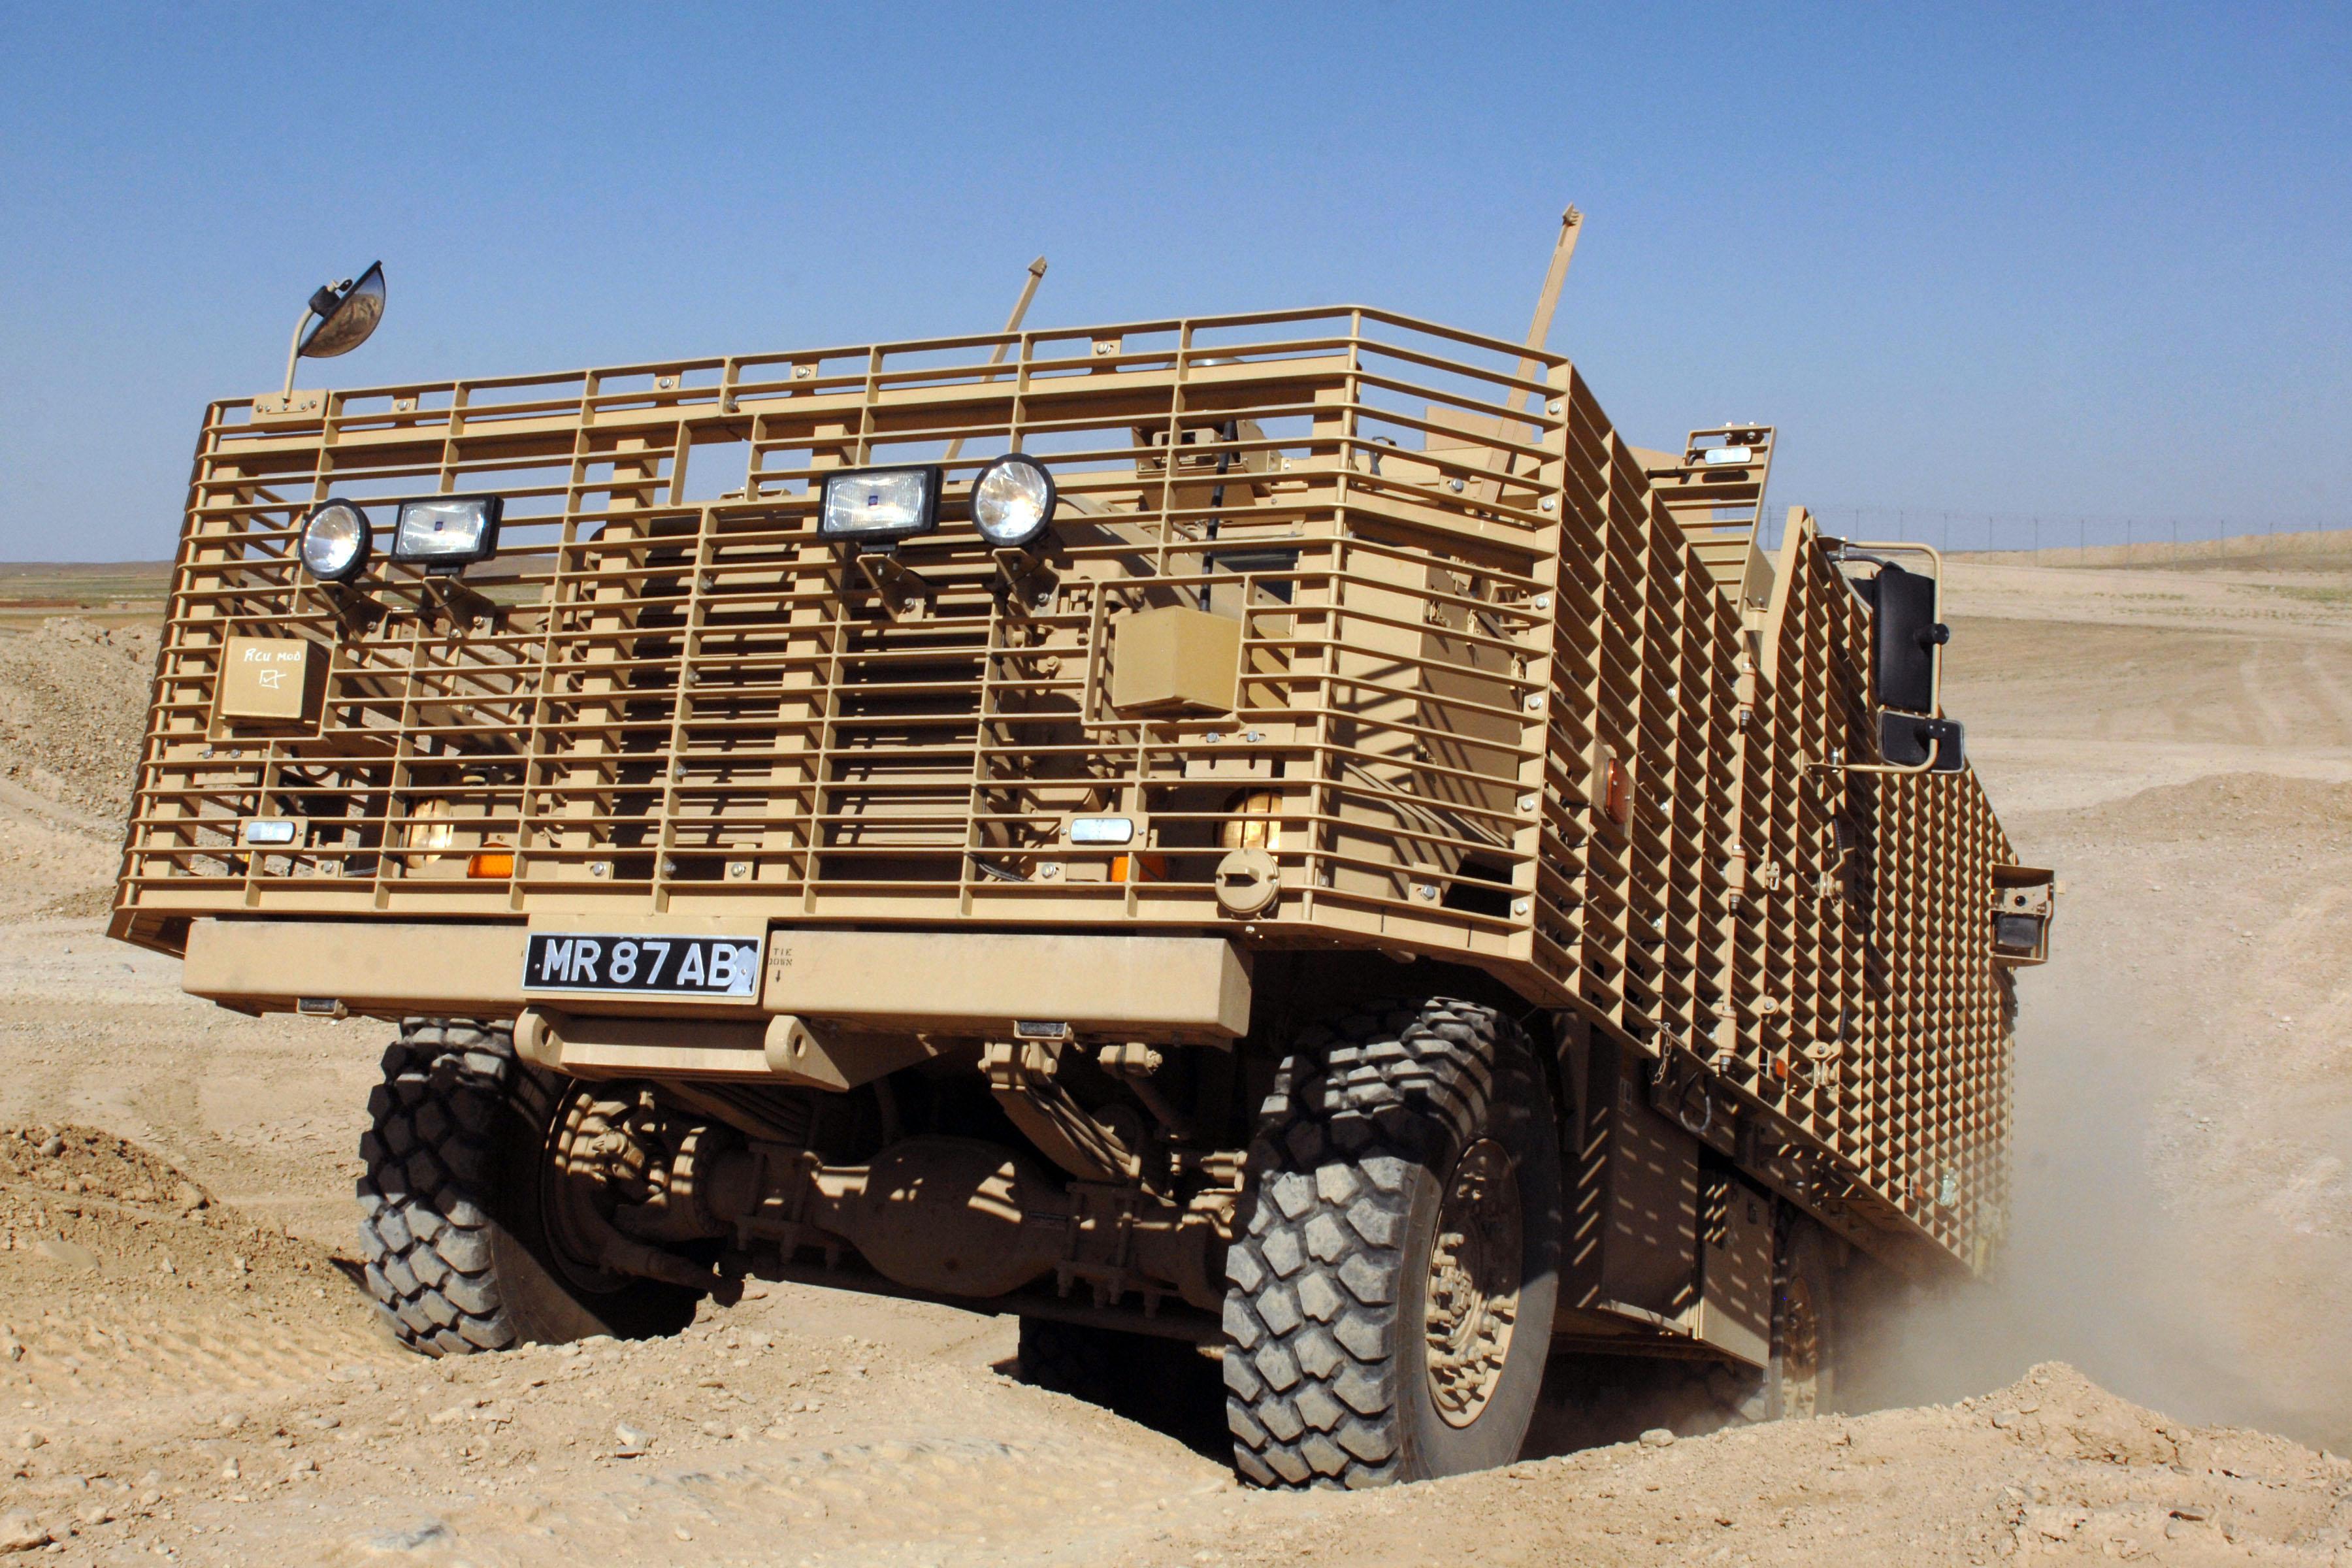 Cougar (vehicle) - Wikipedia